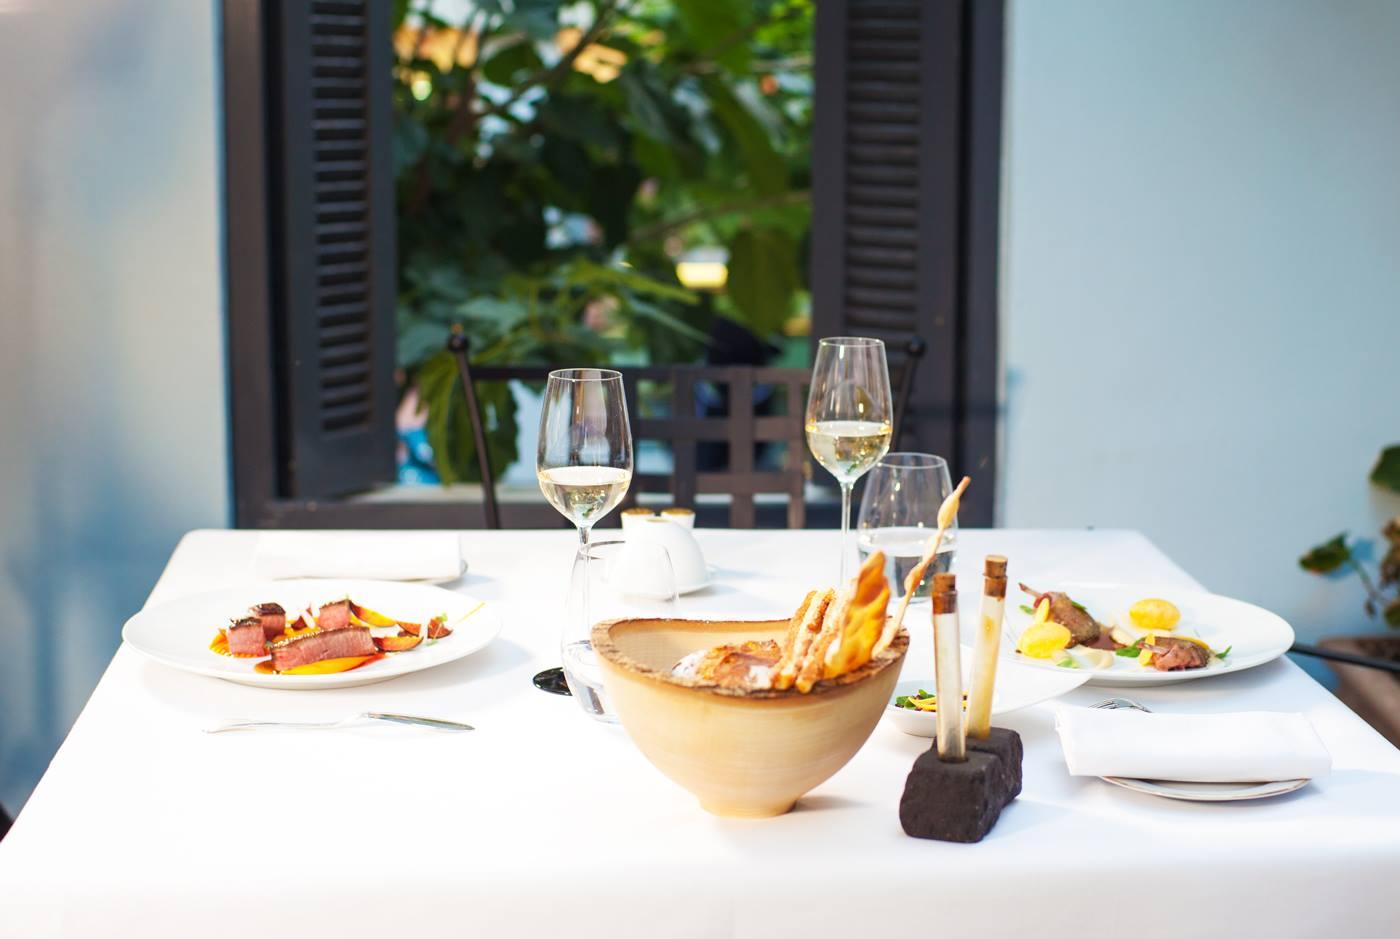 Greek inspirations meet haute cuisine at Spondi (Picture by Spondi/Facebook)